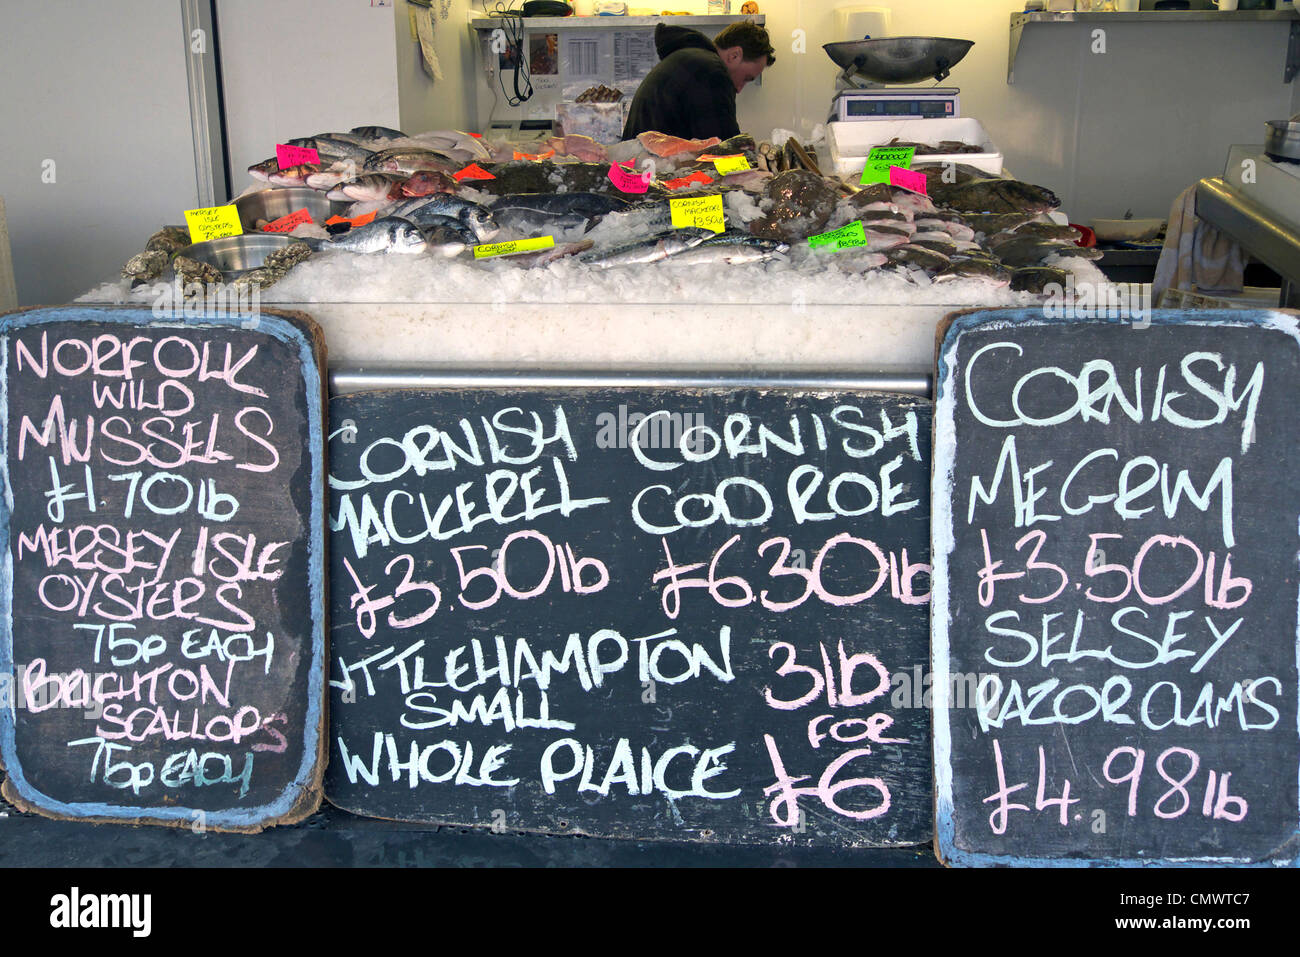 united kingdom littlehampton a wet fish display on a fishmongers stall - Stock Image